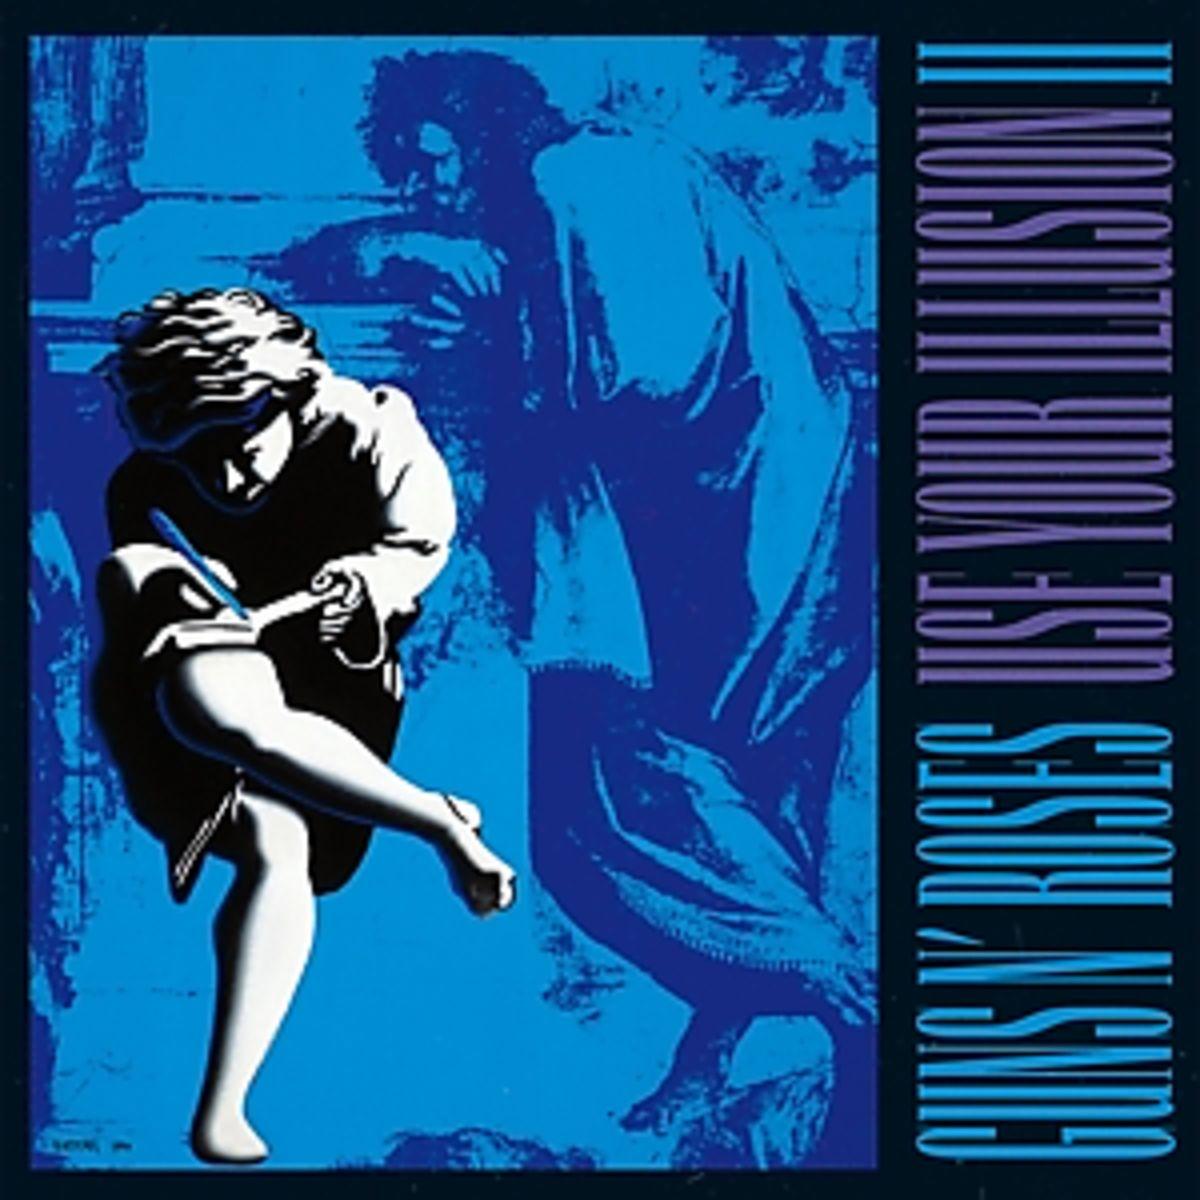 Use Your Illusion 2 - Guns 'N' Roses - Musik - GEFFEN - 0720642442012 - October 13, 2008